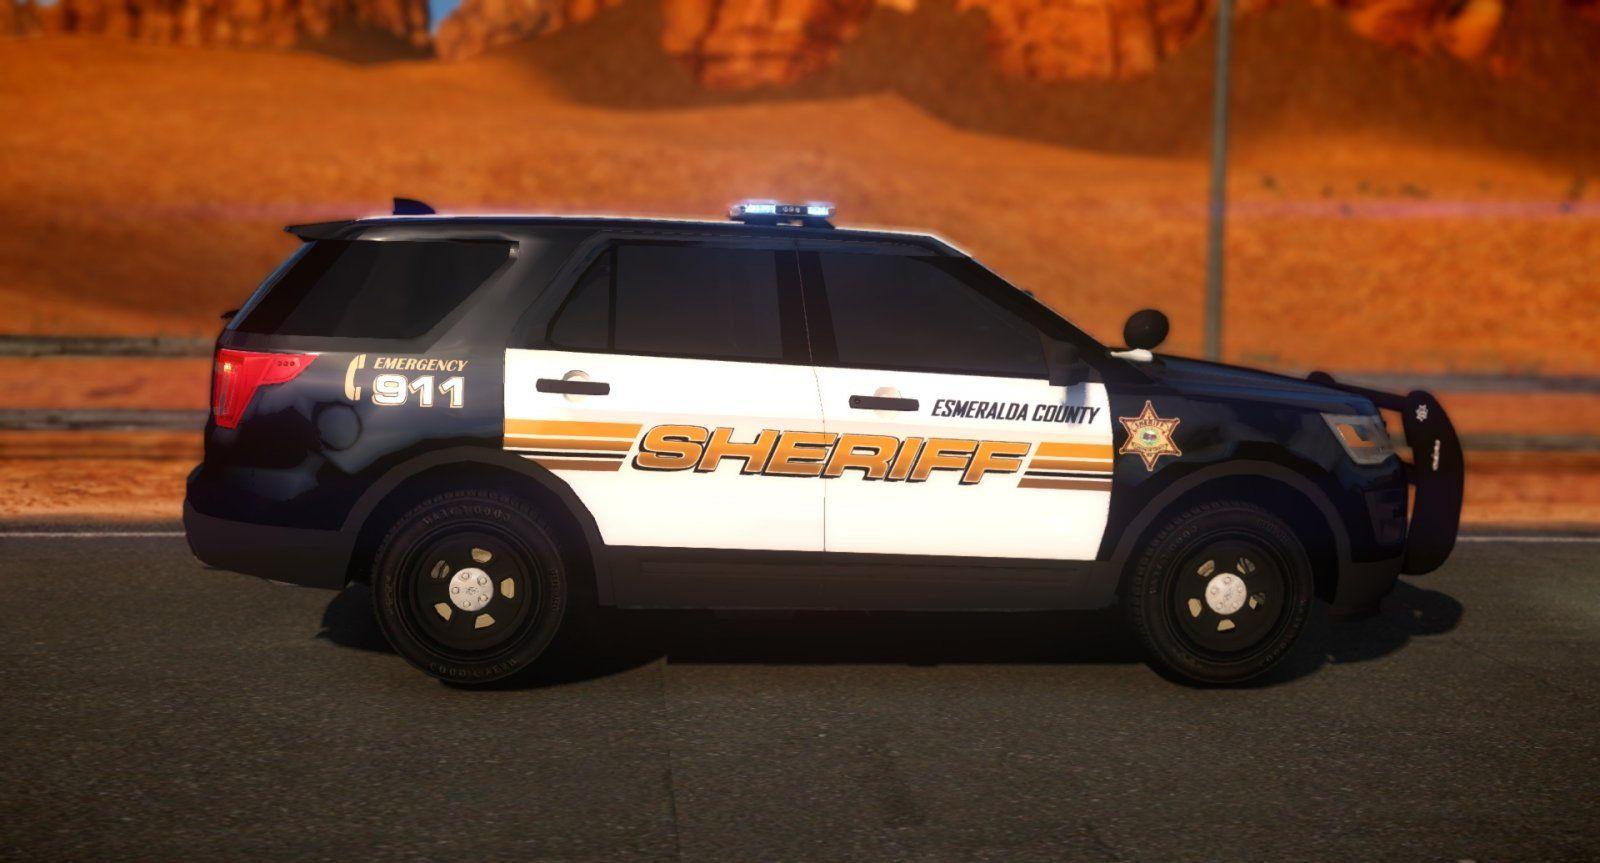 Nv Esmeralda County Sheriffs Dept Police Cars Police Sheriff